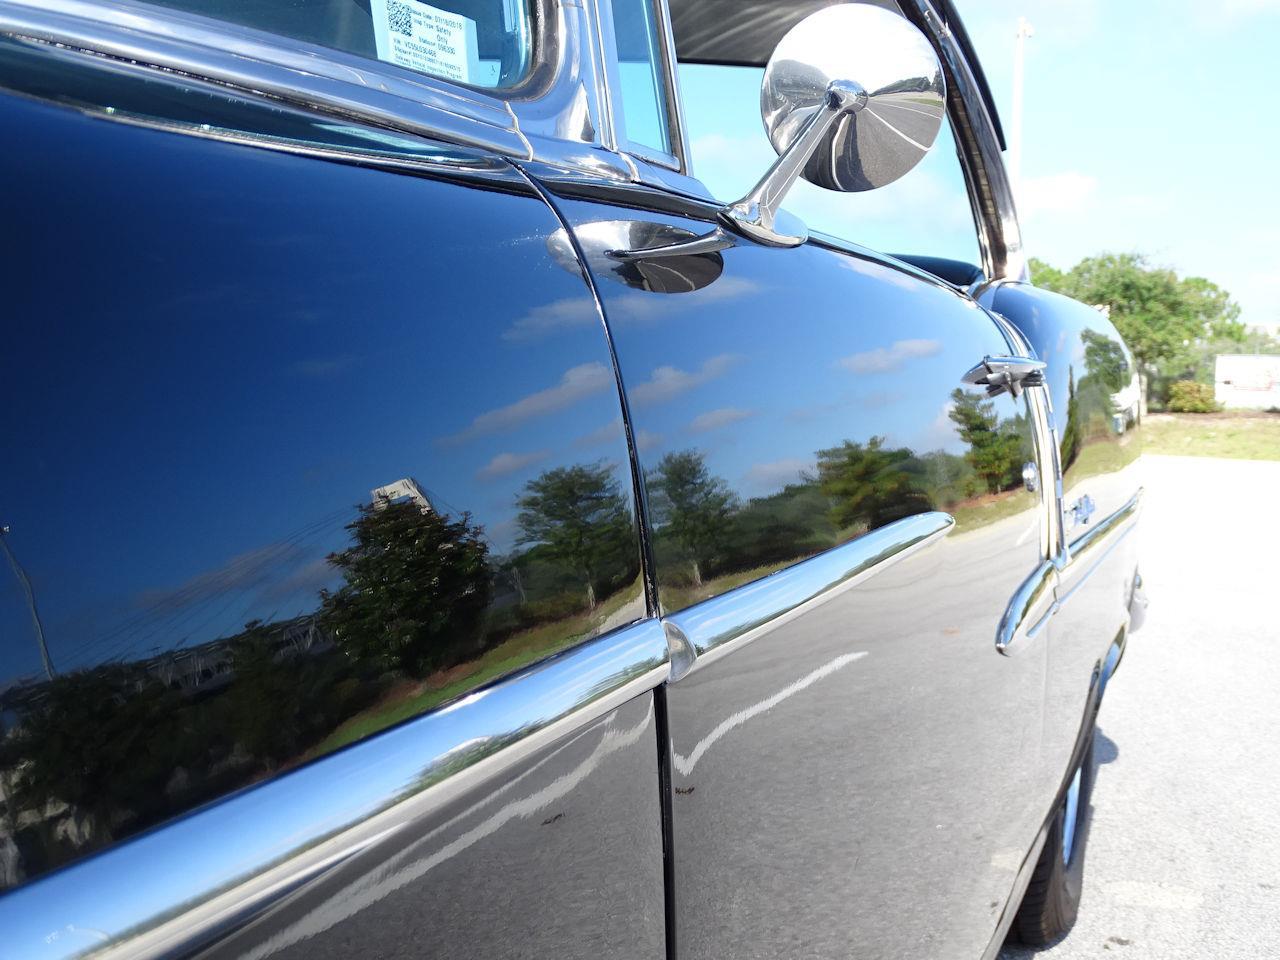 1955 Chevrolet Bel Air (CC-1359965) for sale in O'Fallon, Illinois